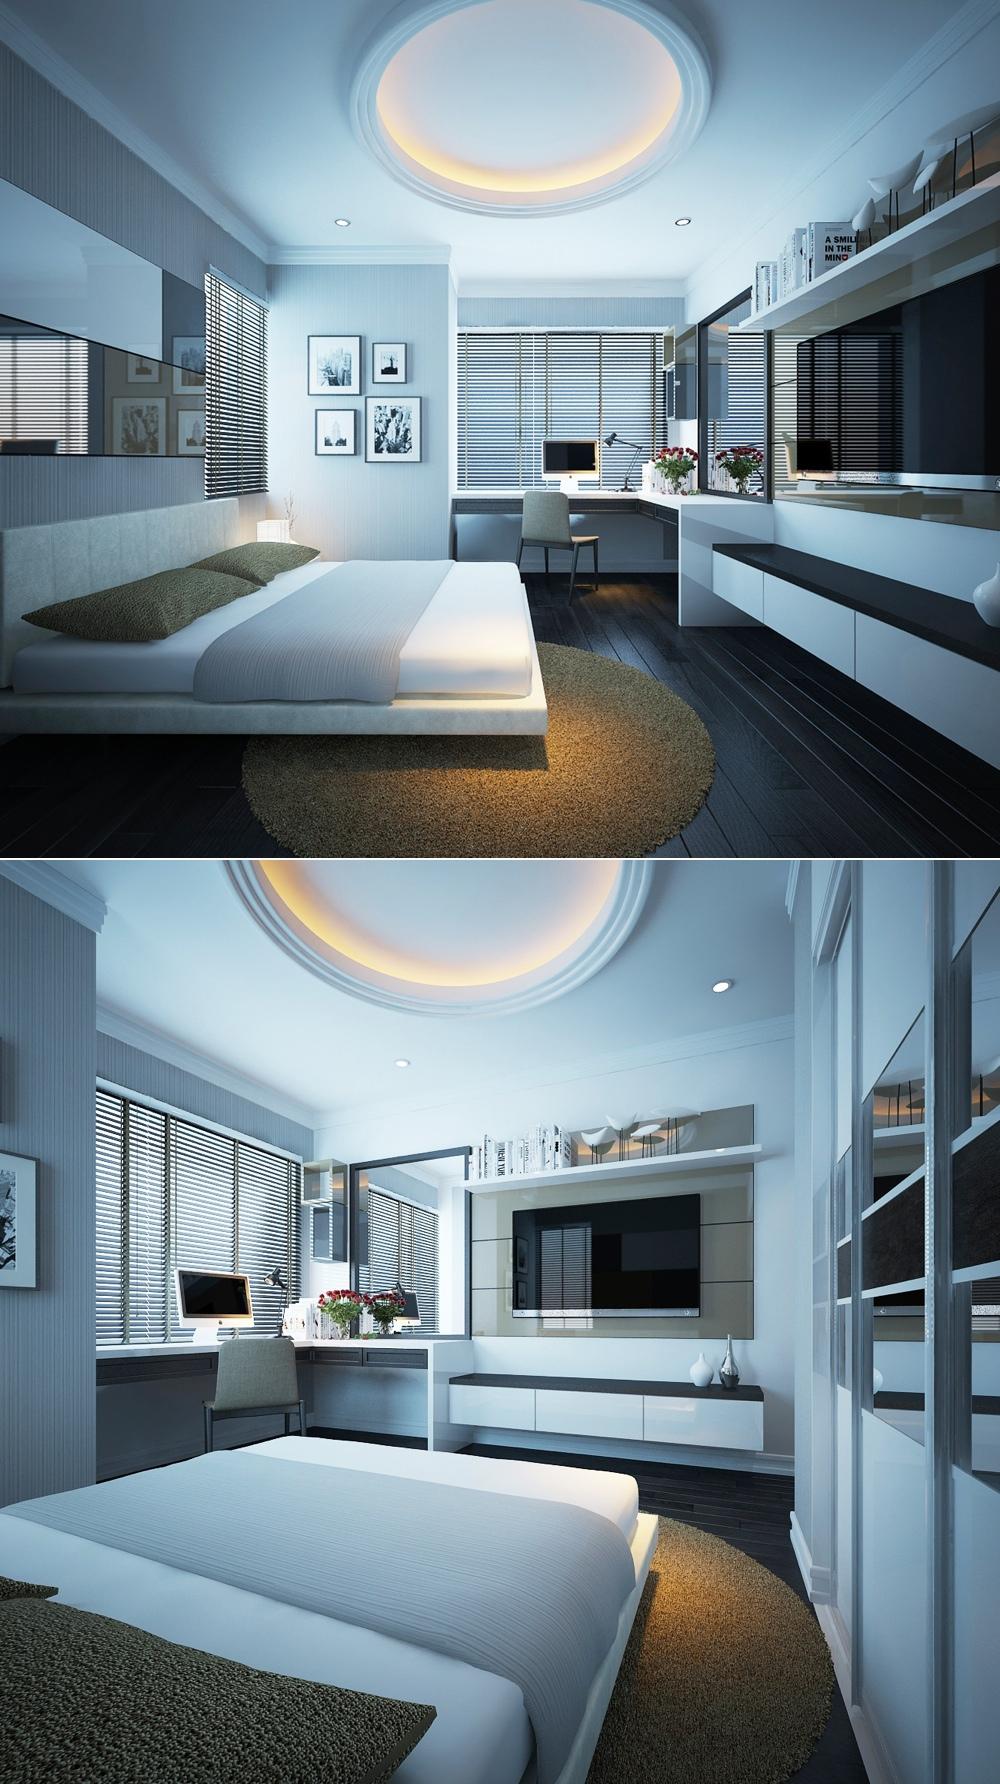 20-White-platform-bed